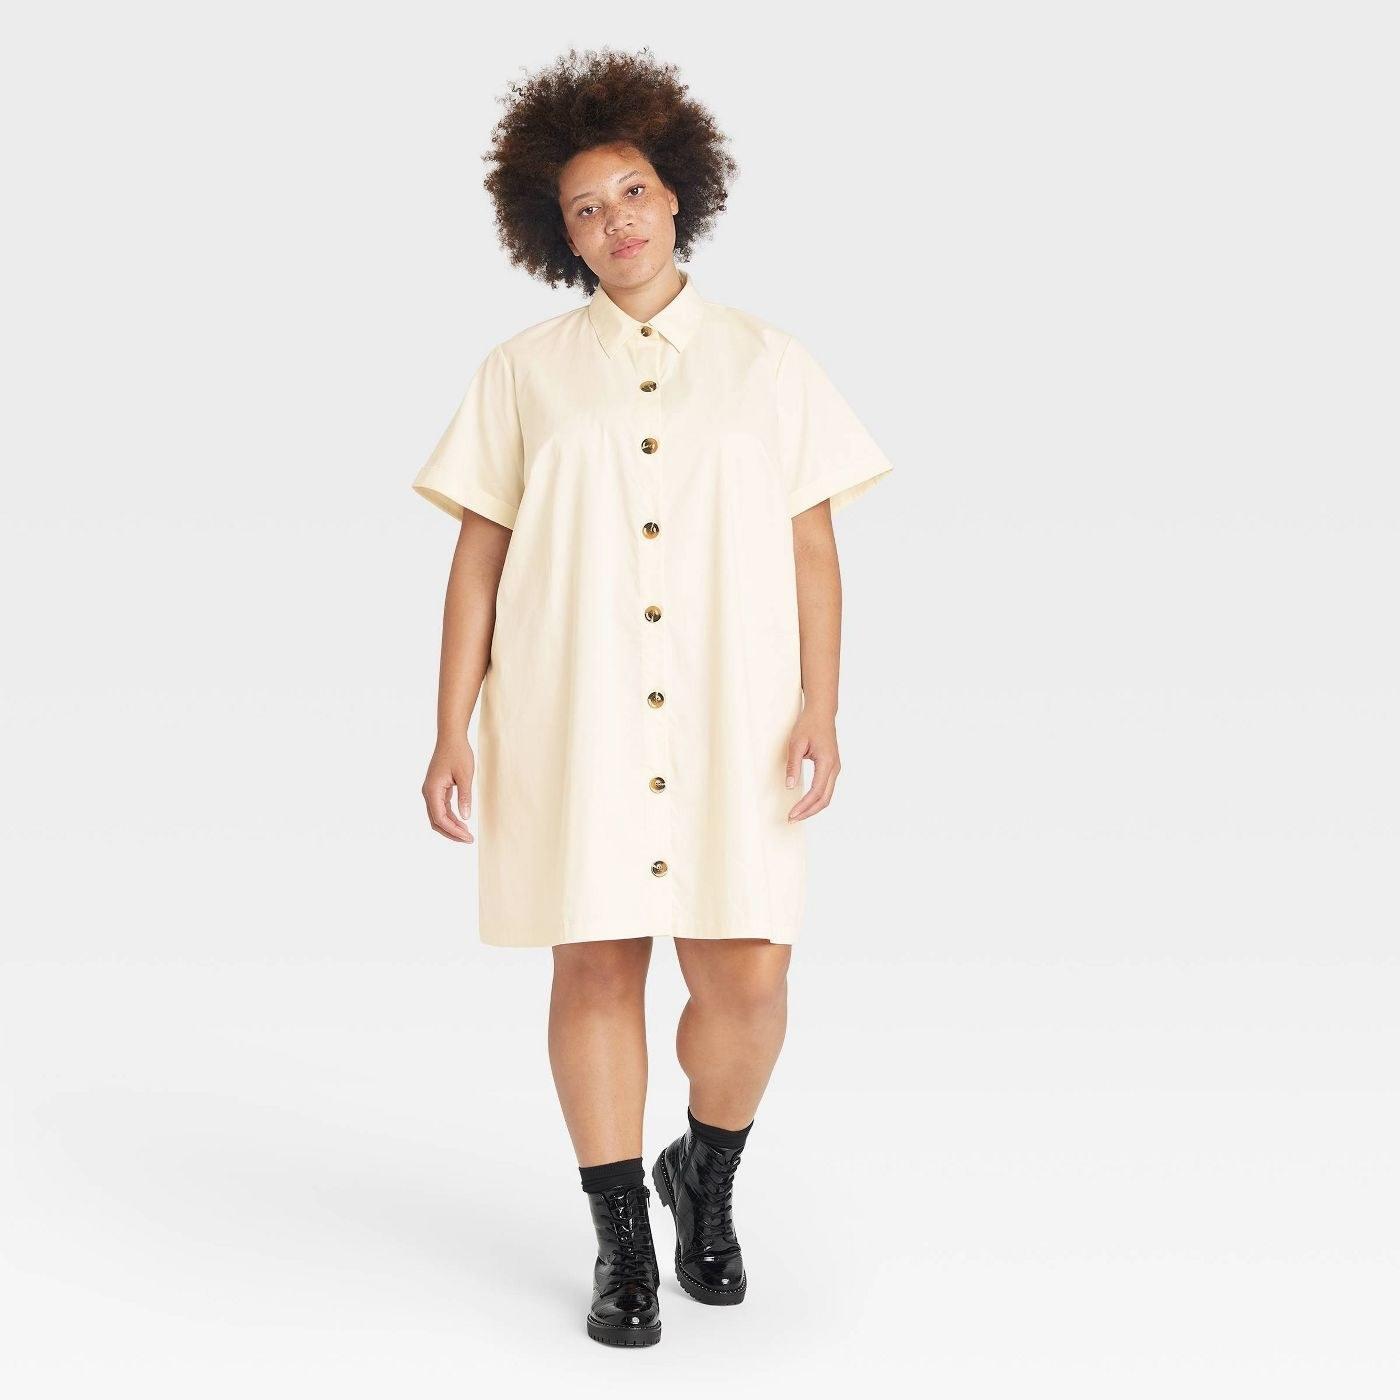 Model wearing off-white button down shirt dress